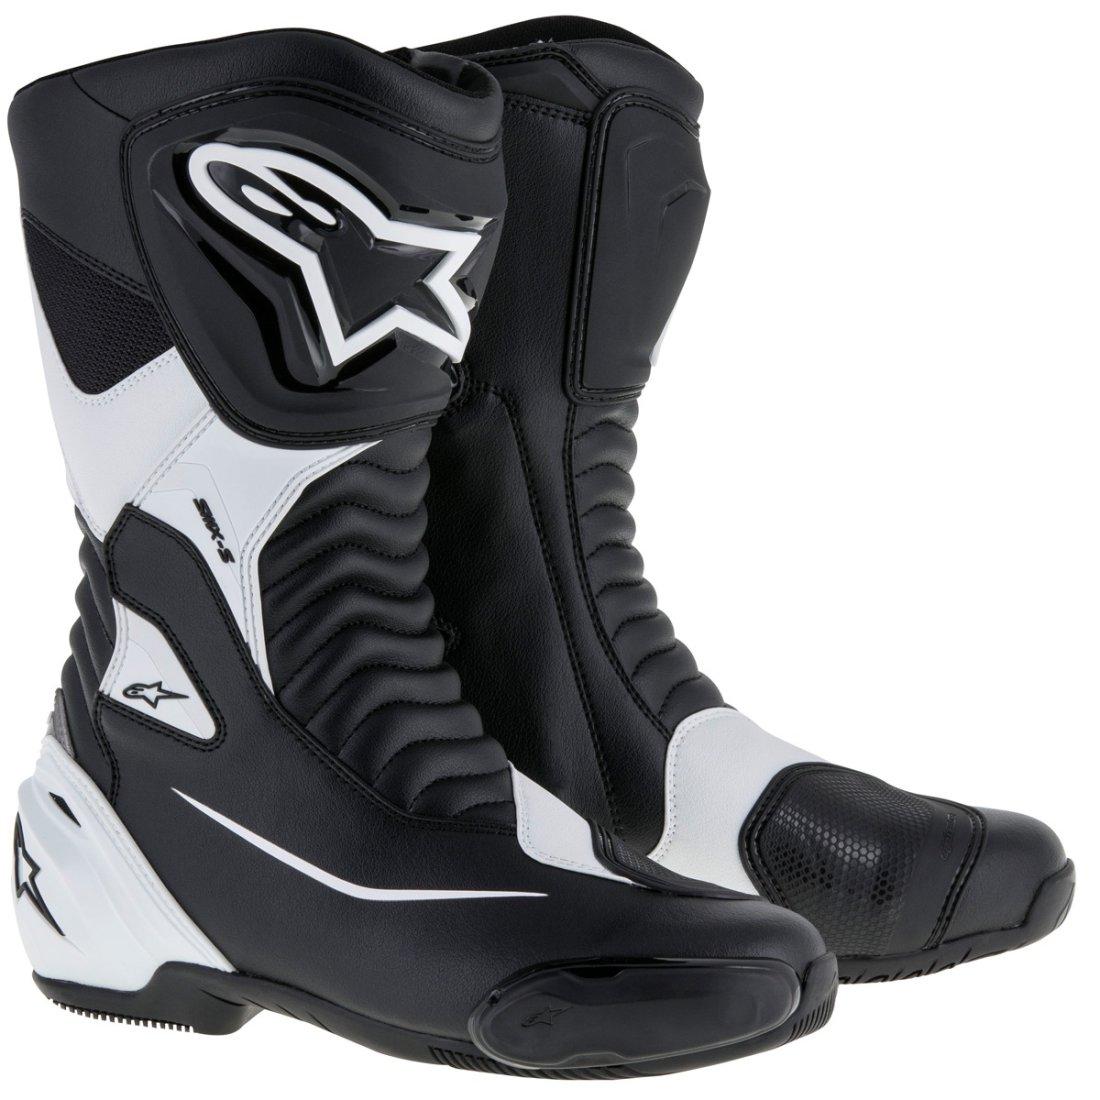 ALPINESTARS SMX-S Black / White Boots